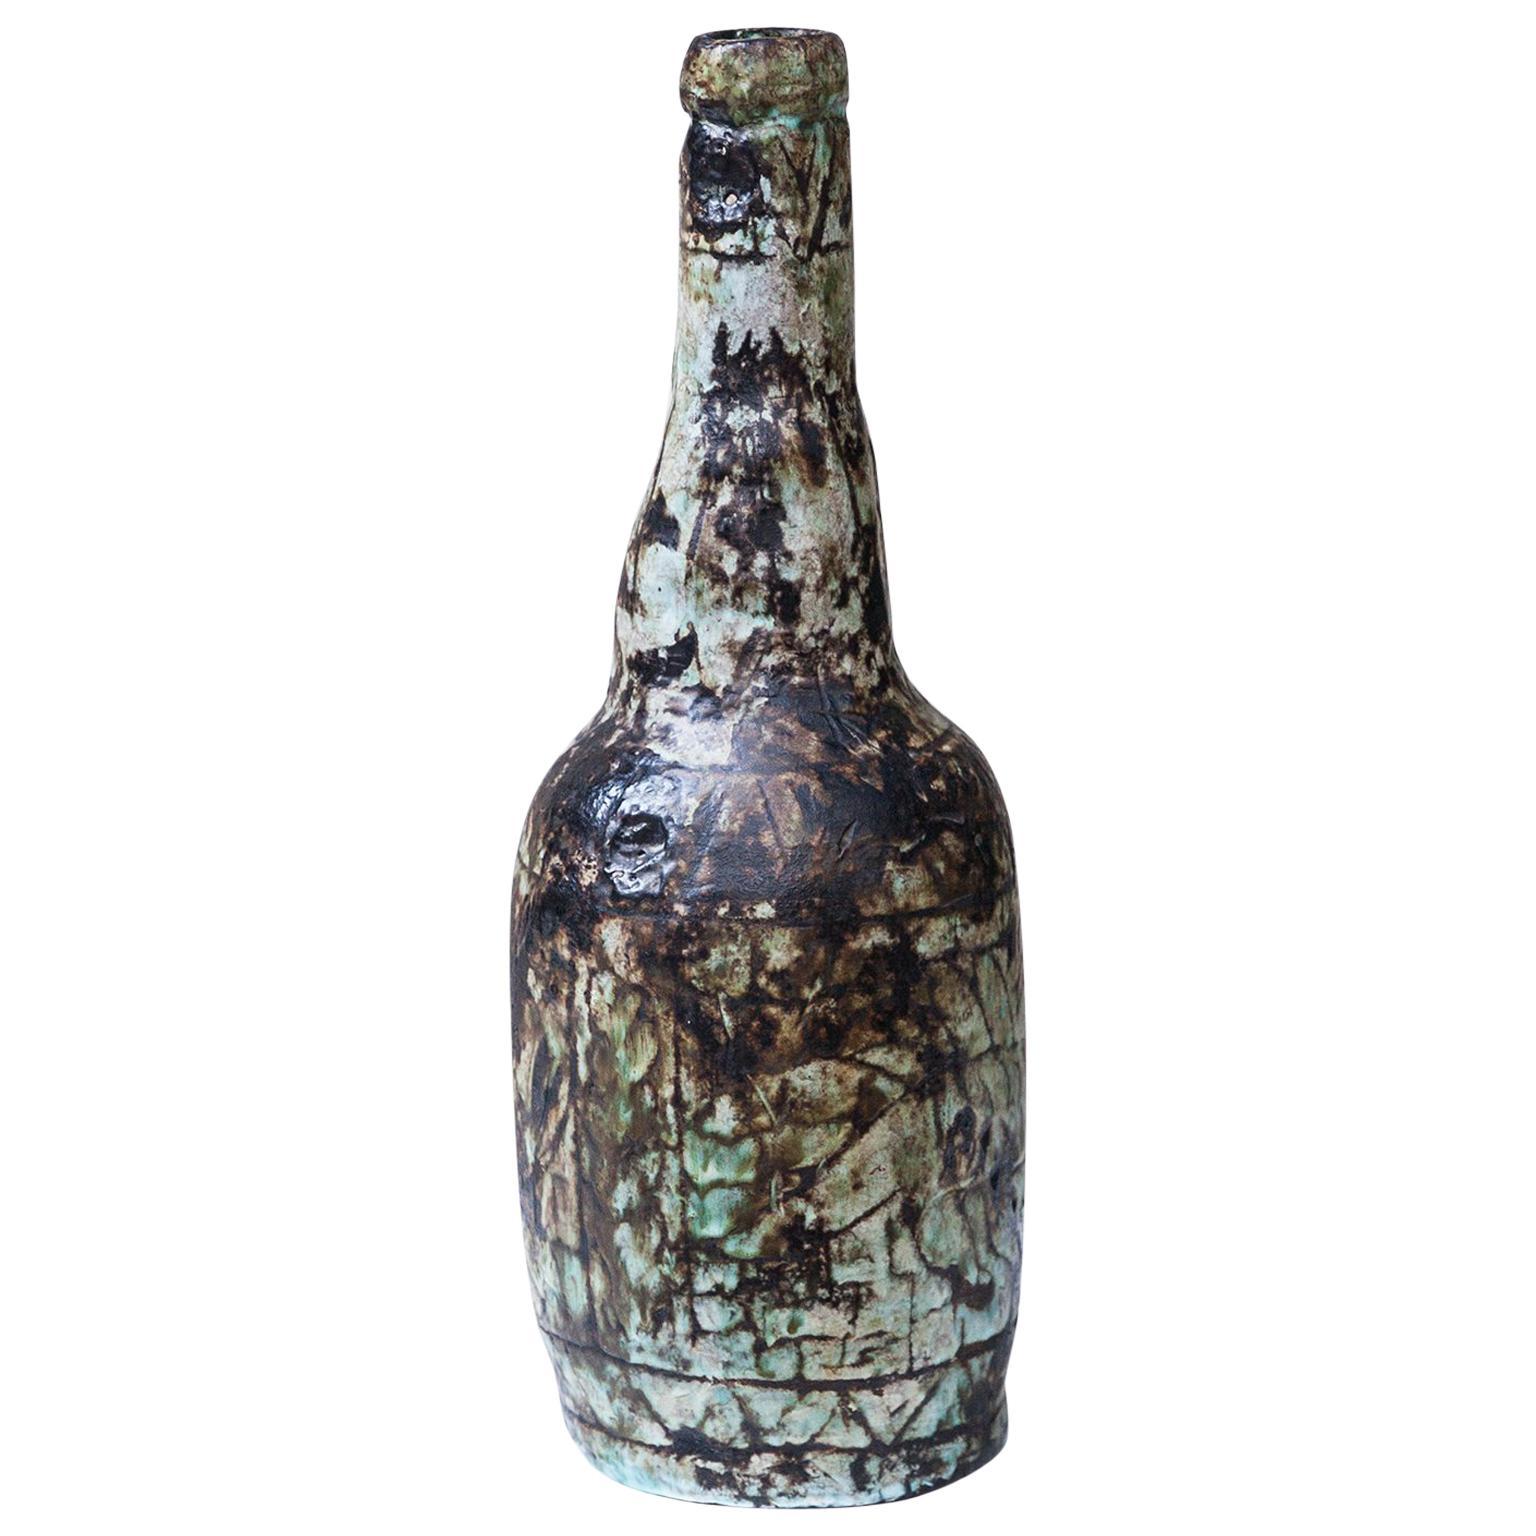 Huge Art Pottery Jerome Massier Vallauris Vase, 1960s